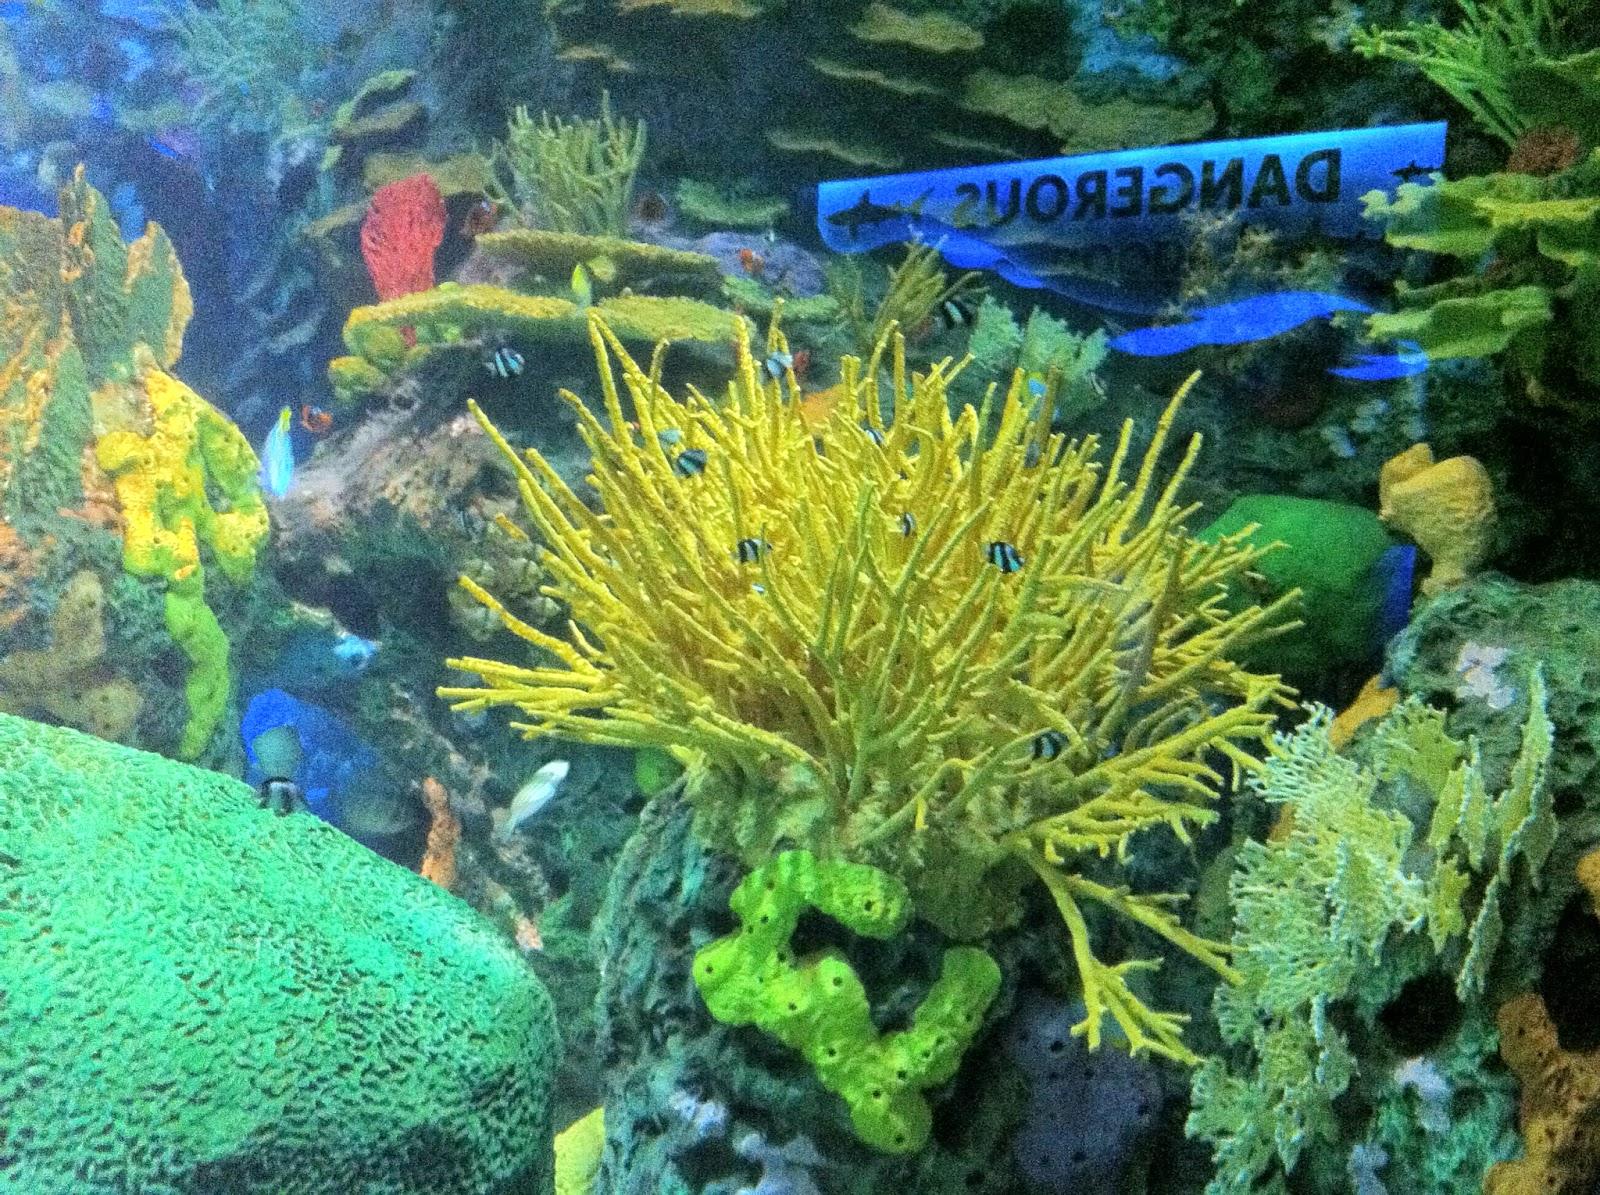 toronto, toronto artist, aquarium, ripley's aquarium, malinda prudhomme, art, fish